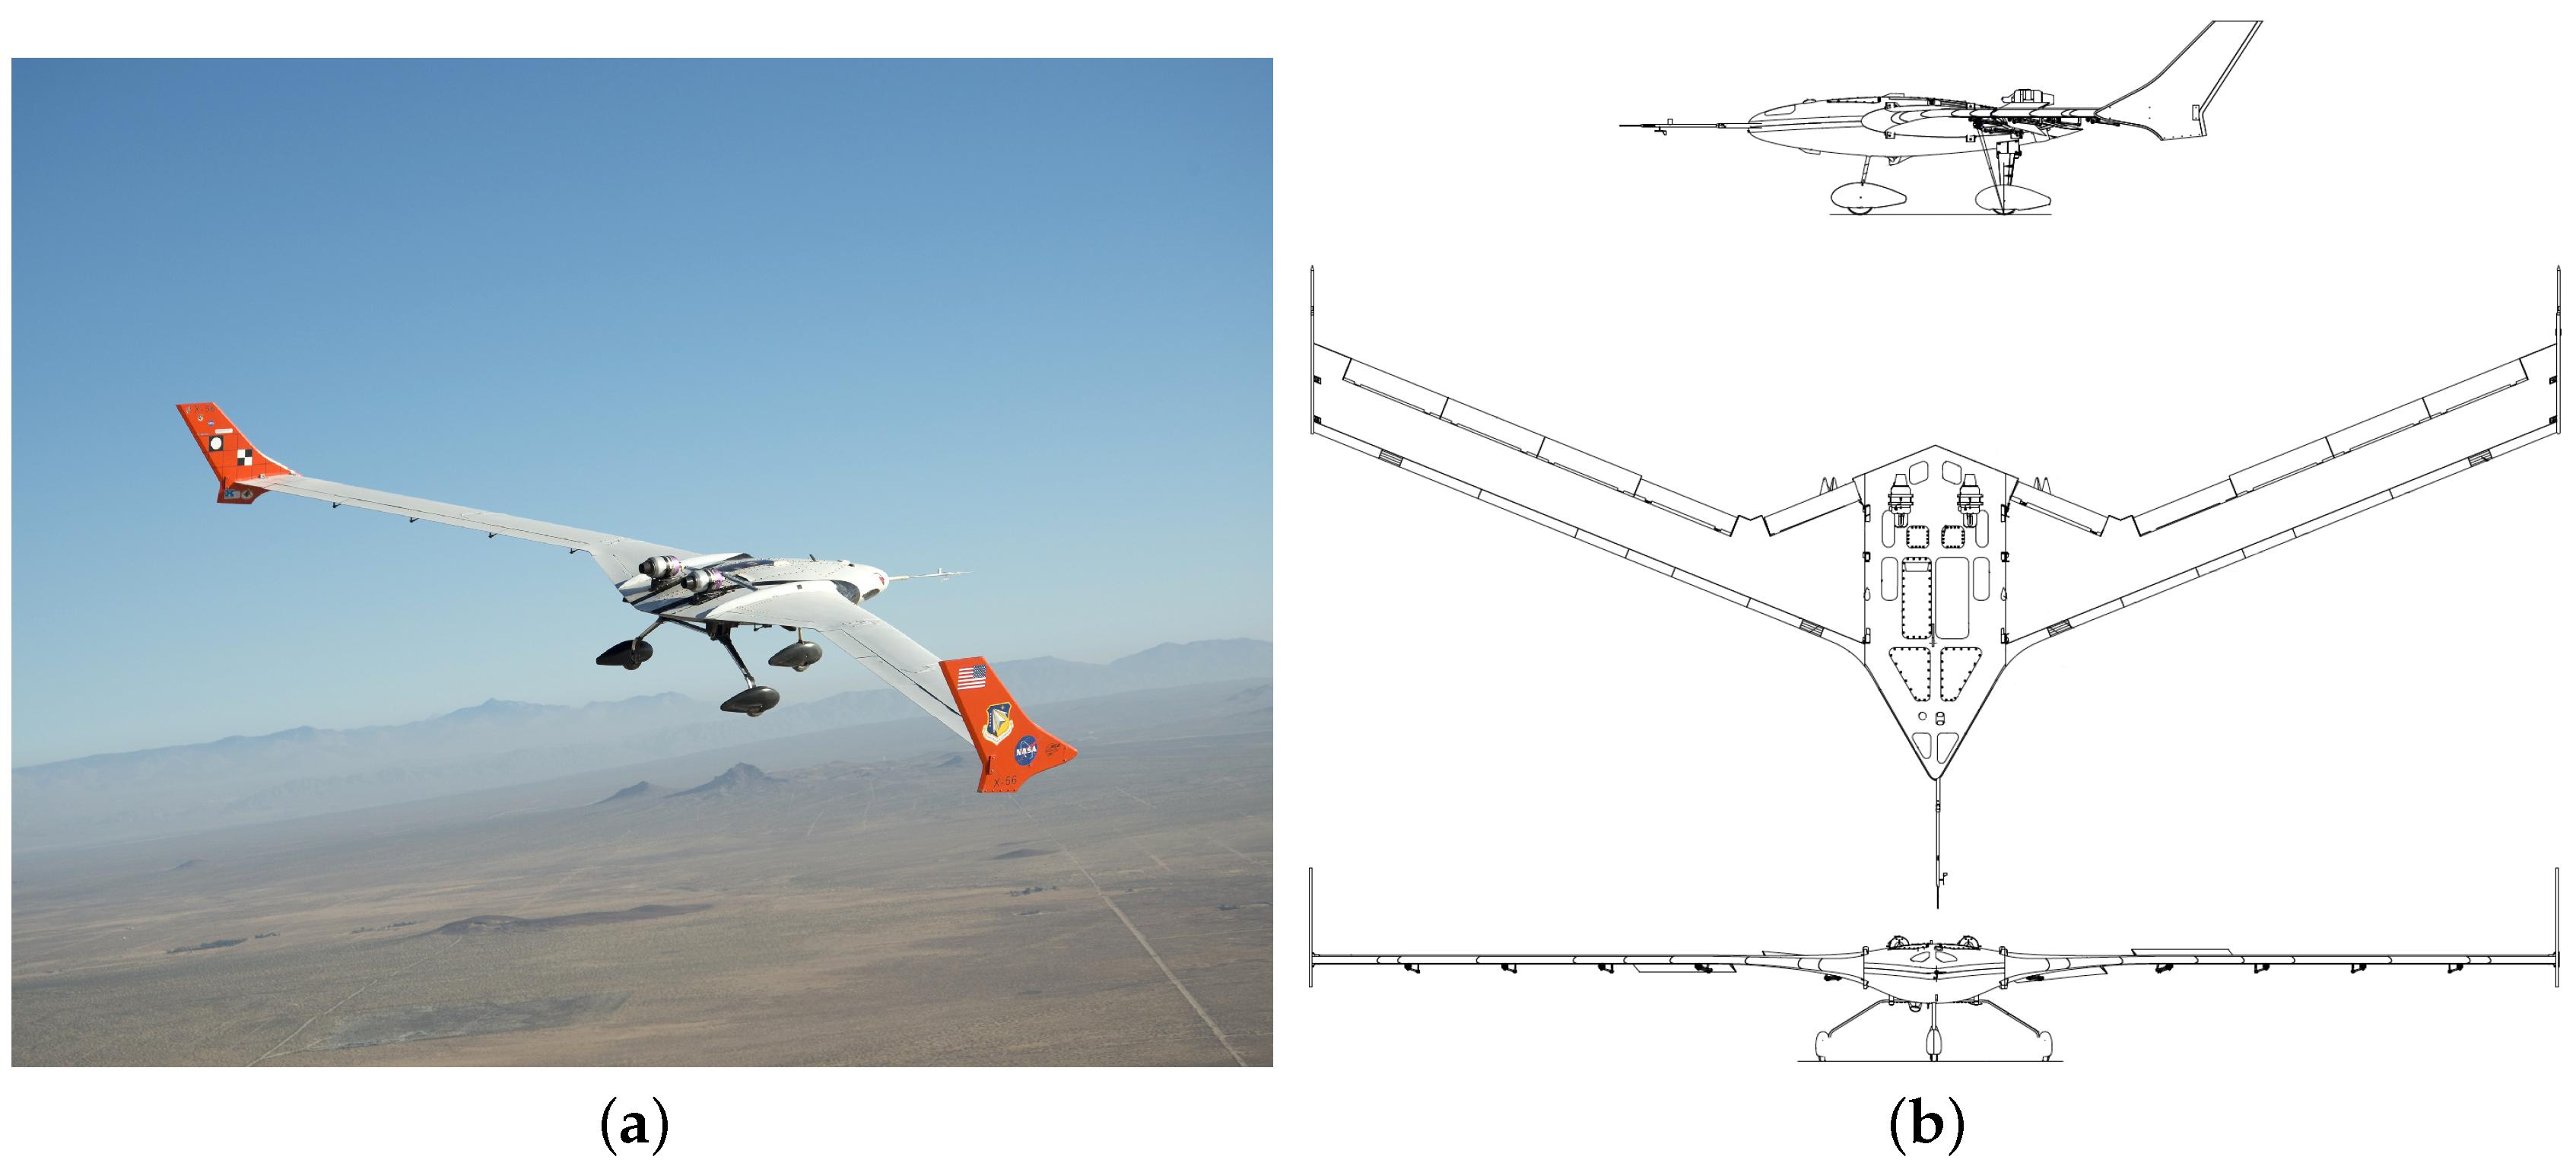 Aerospace | Free Full-Text | Identification of Aeroelastic Models